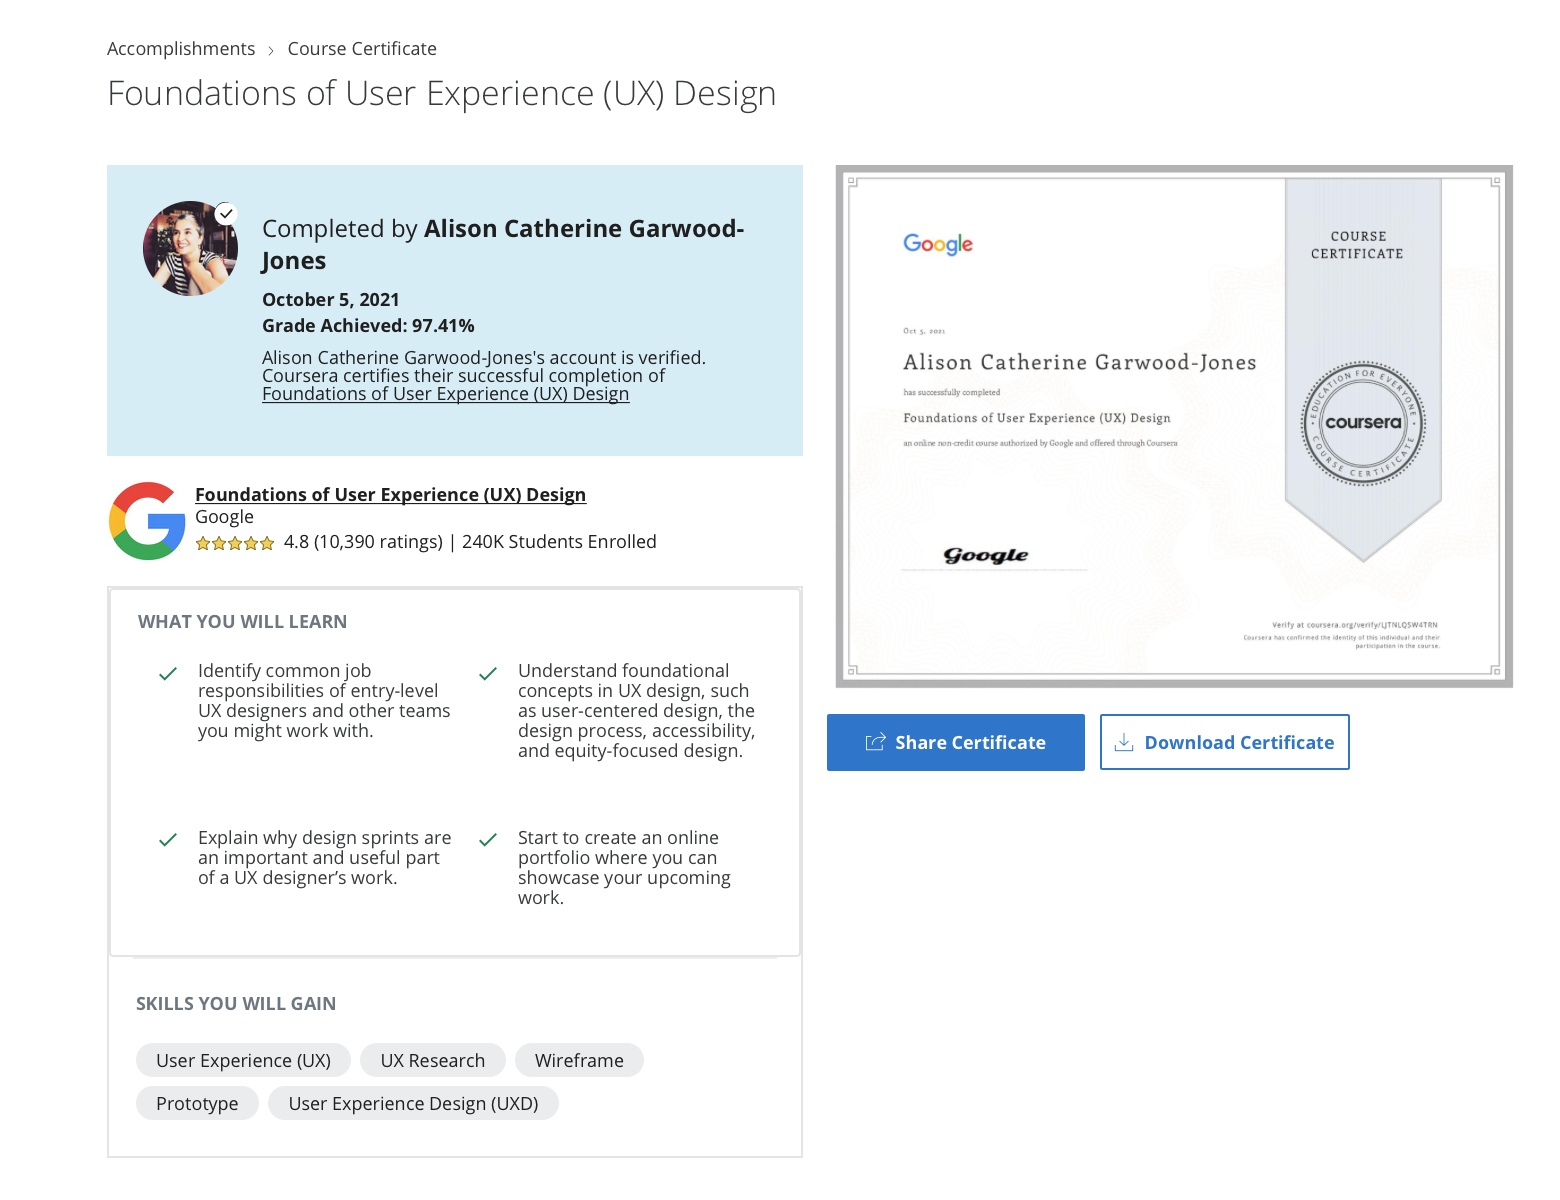 Google Certificate in Foundations of User (UX) Design